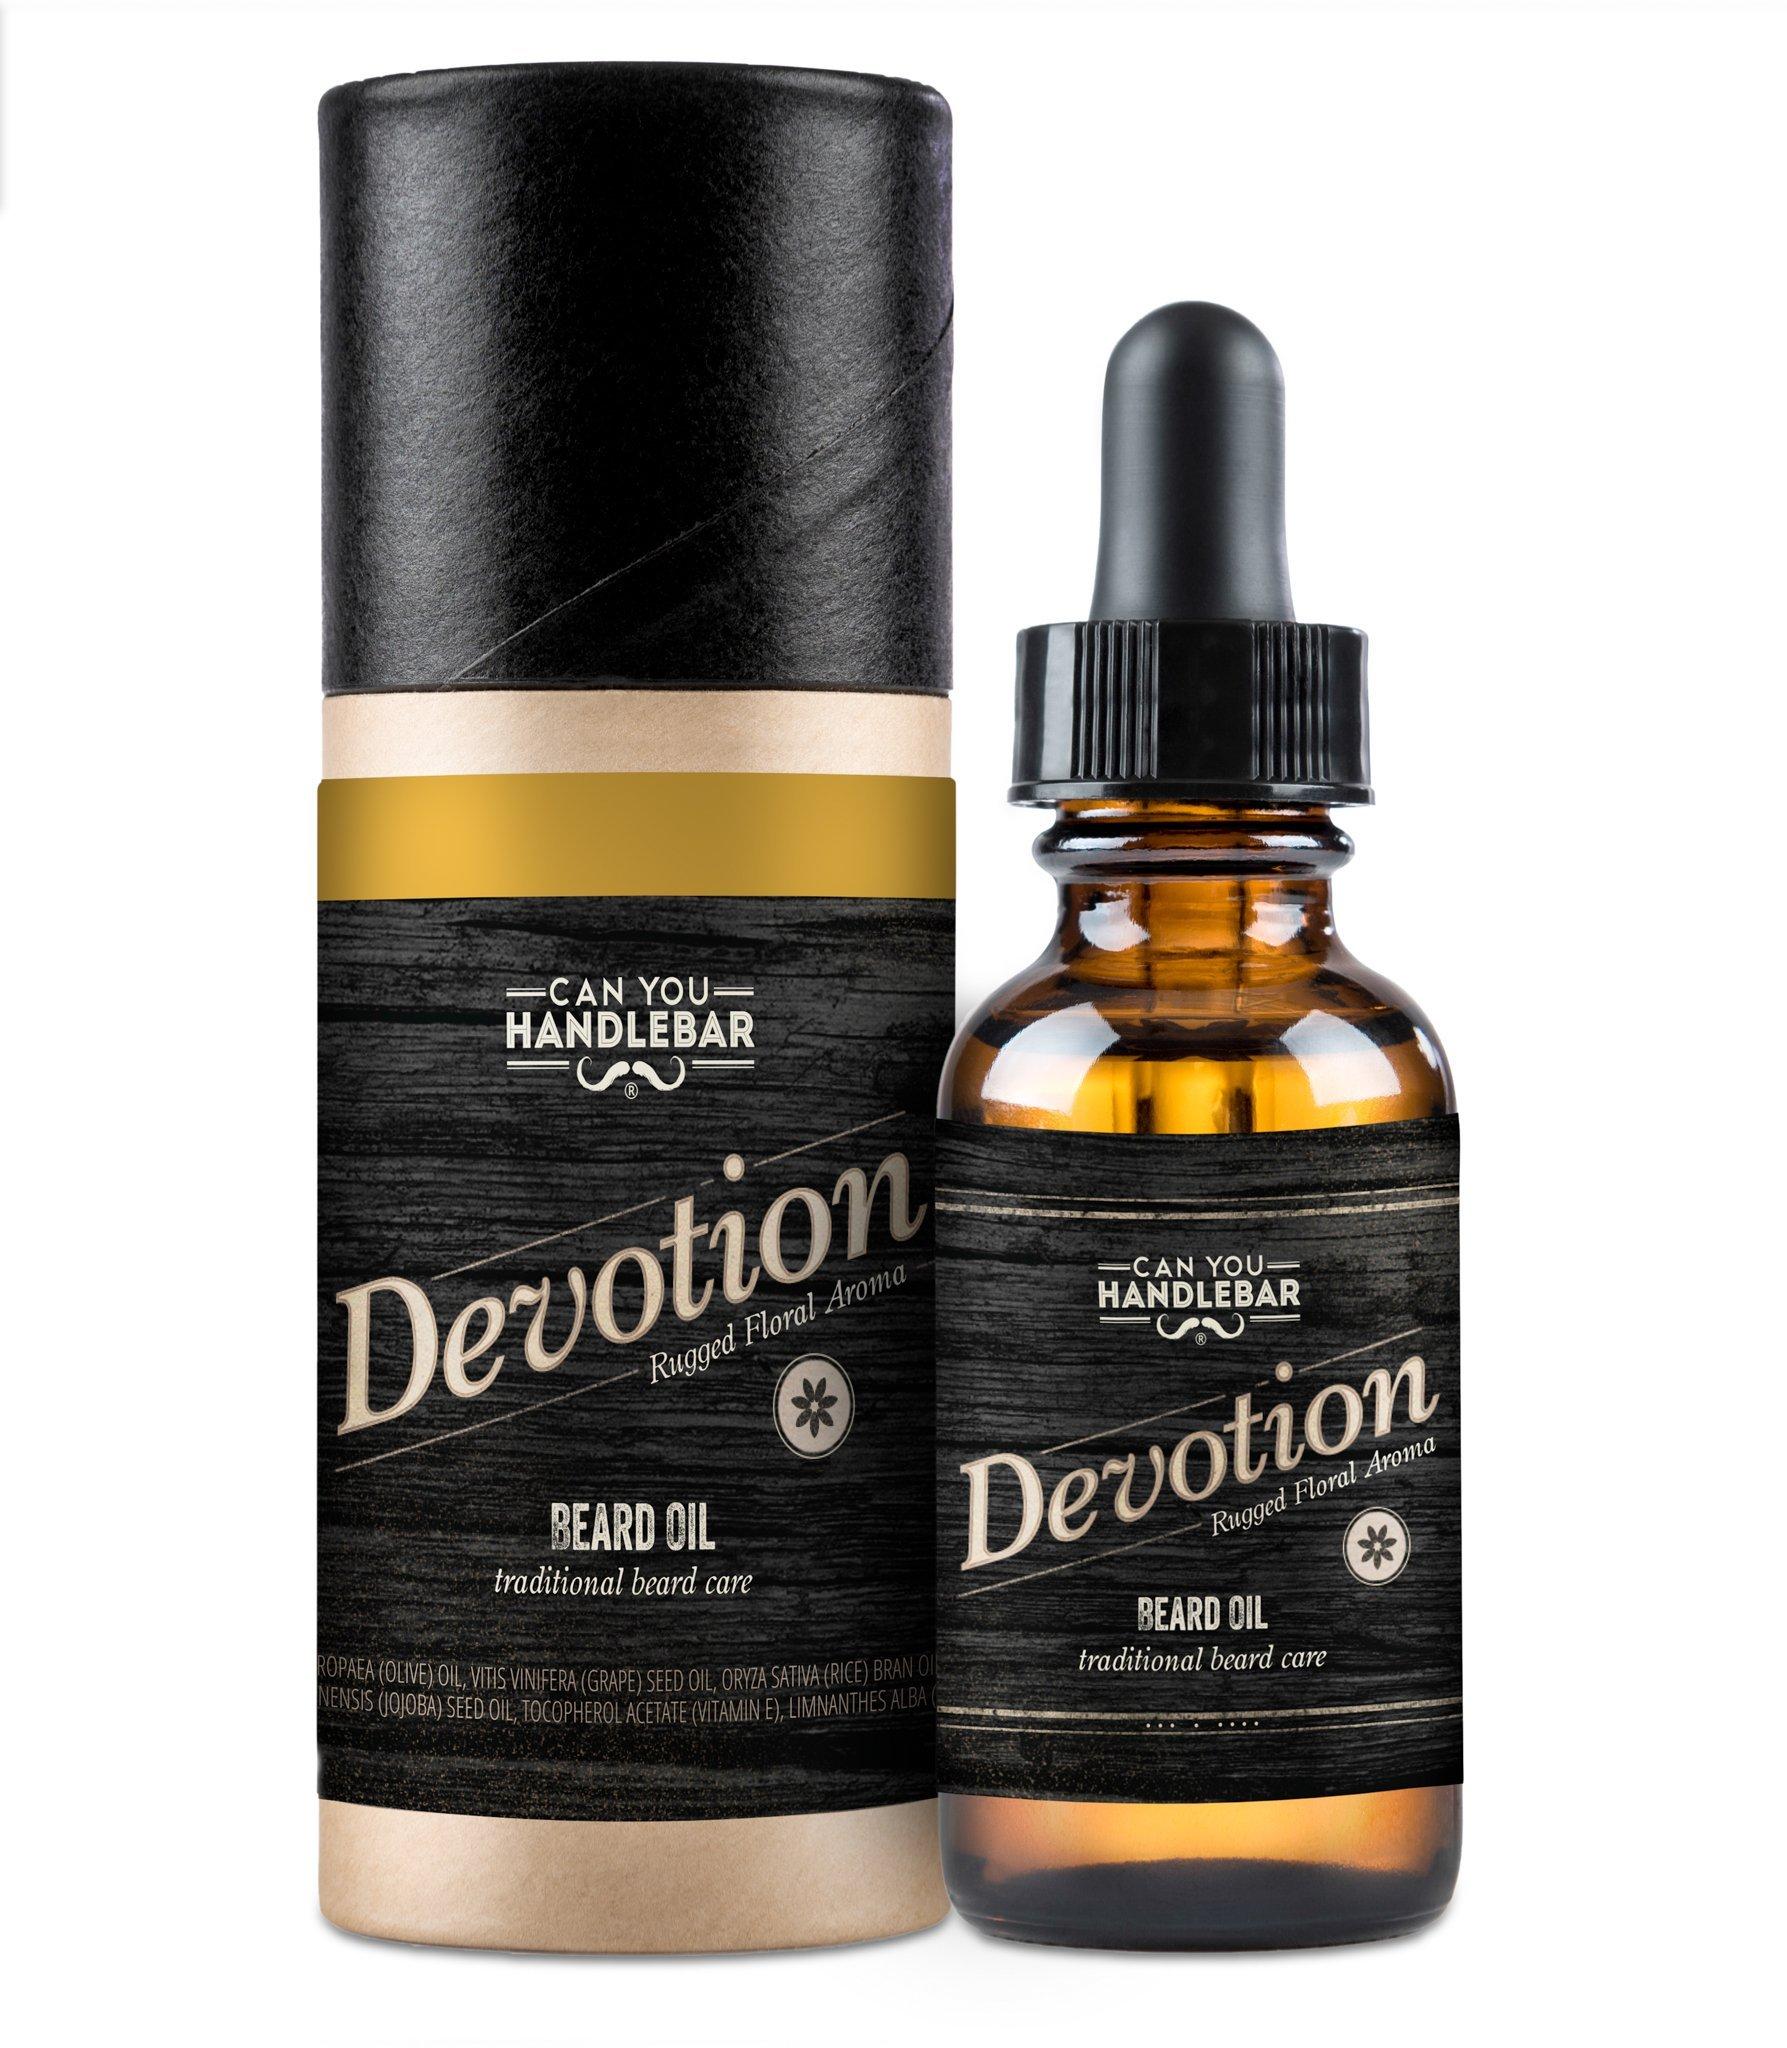 Can You Handlebar Devotion Premium Beard Oil Bottle: Patchouli Floral